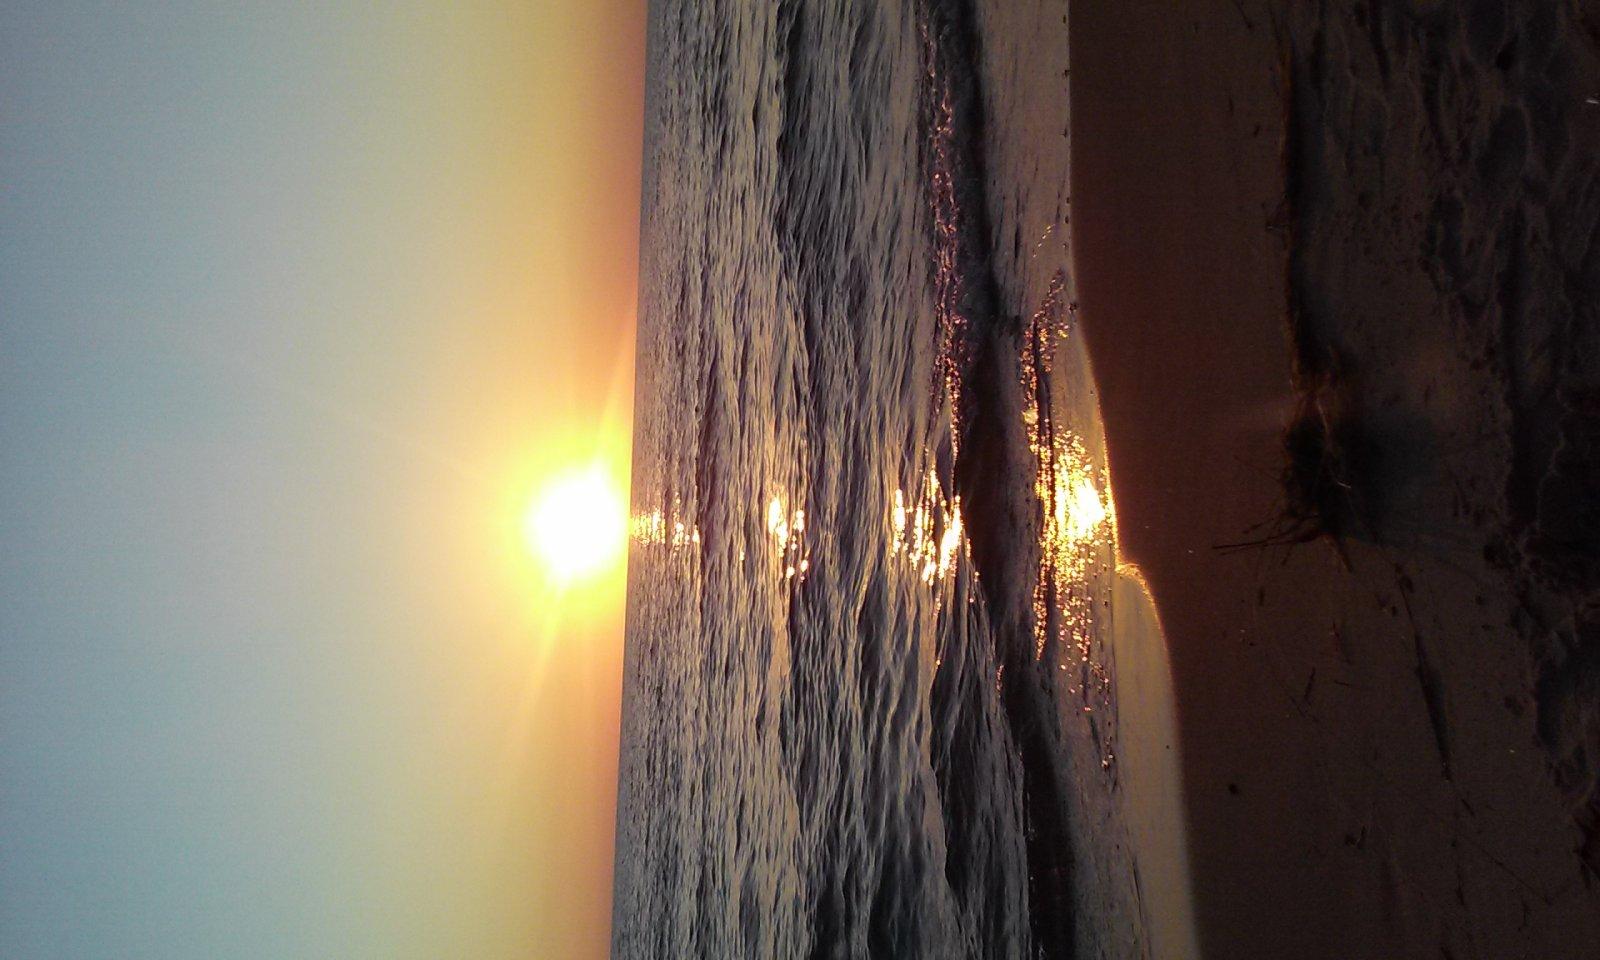 Click image for larger version  Name:Sunset lake MI 2015.jpg Views:120 Size:187.9 KB ID:105302